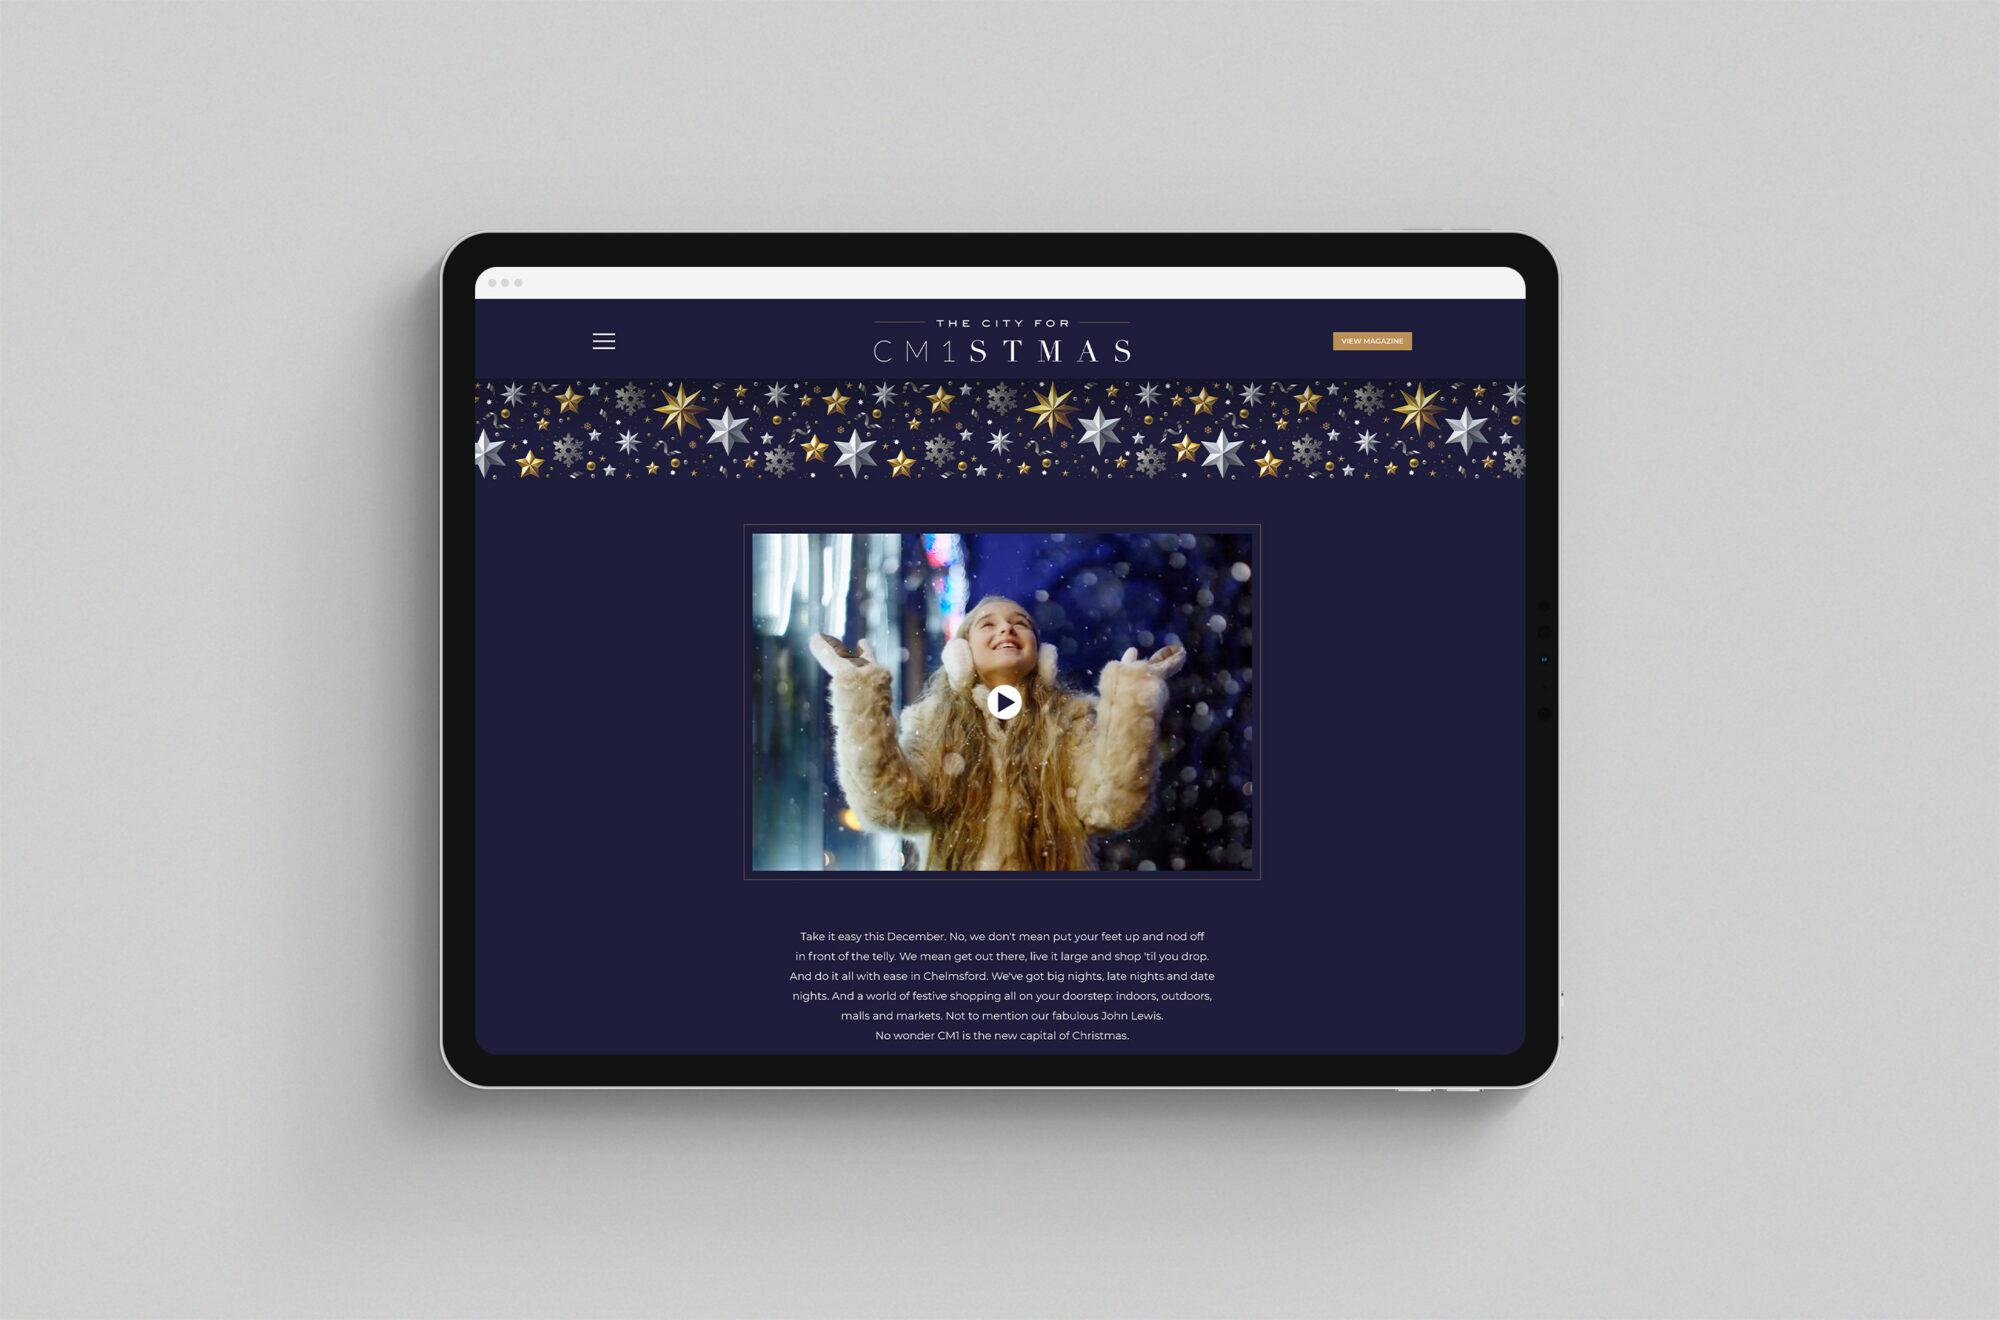 CM1stmas Chelmsford Christmas website ipad